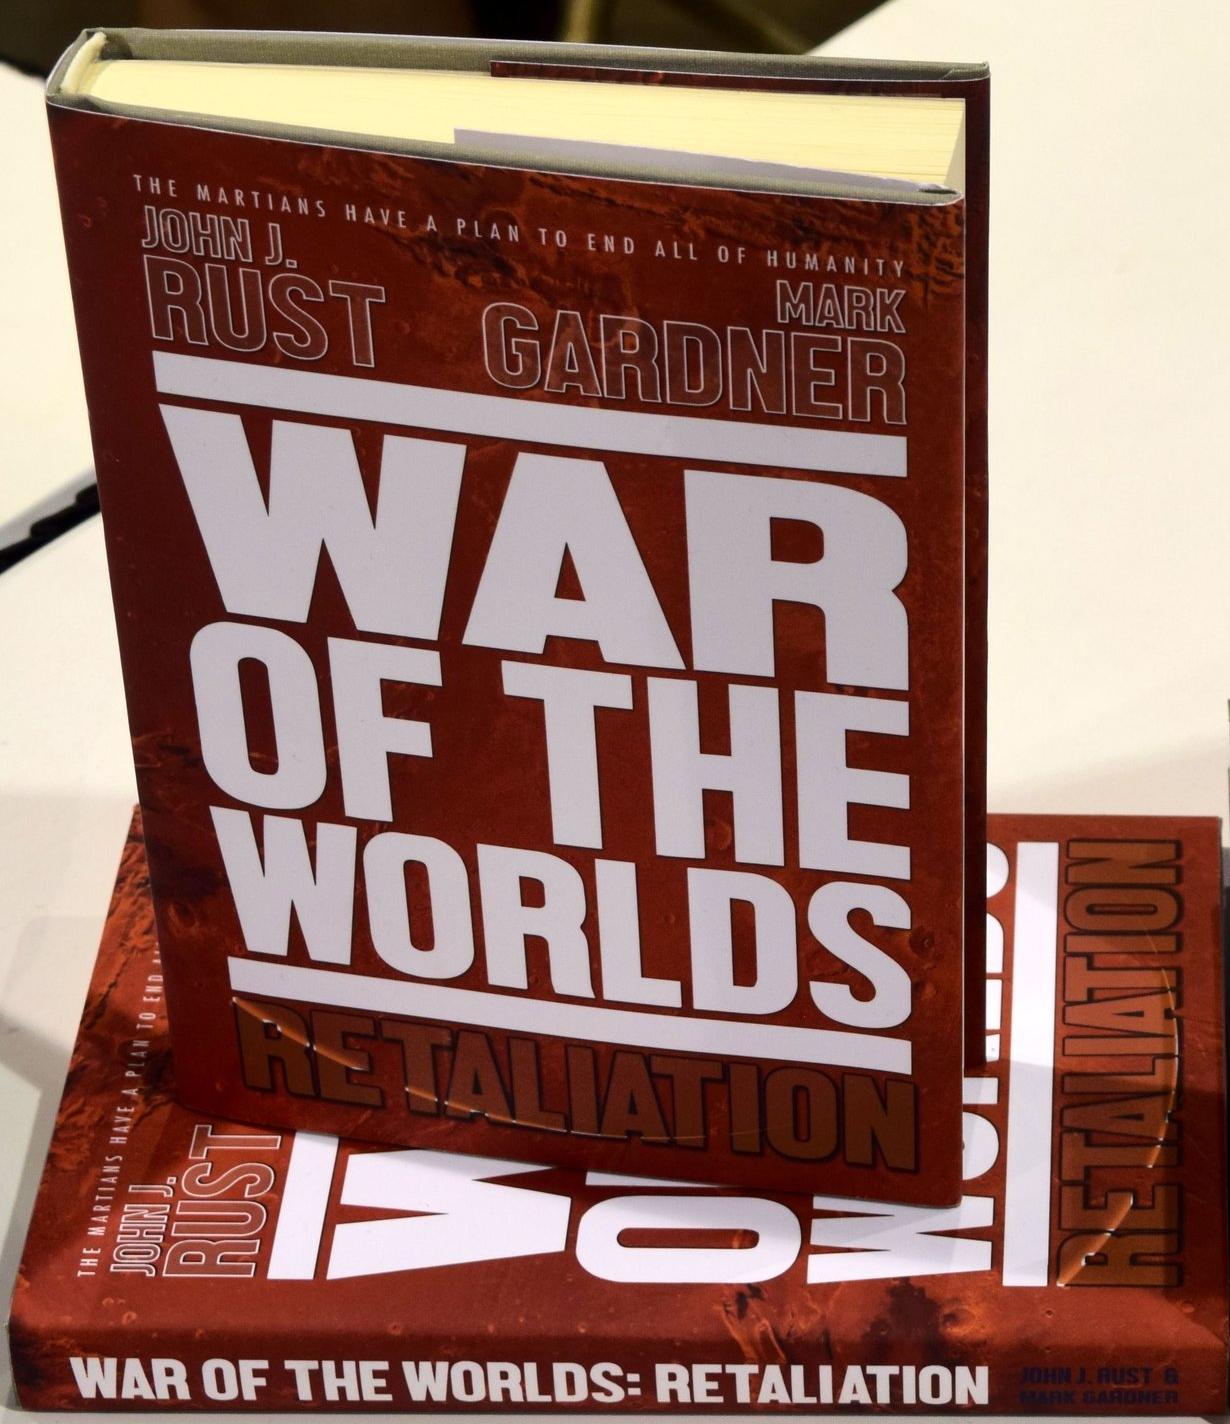 War of the Worlds: Retaliation by John J. Rust & Mark Gardner.